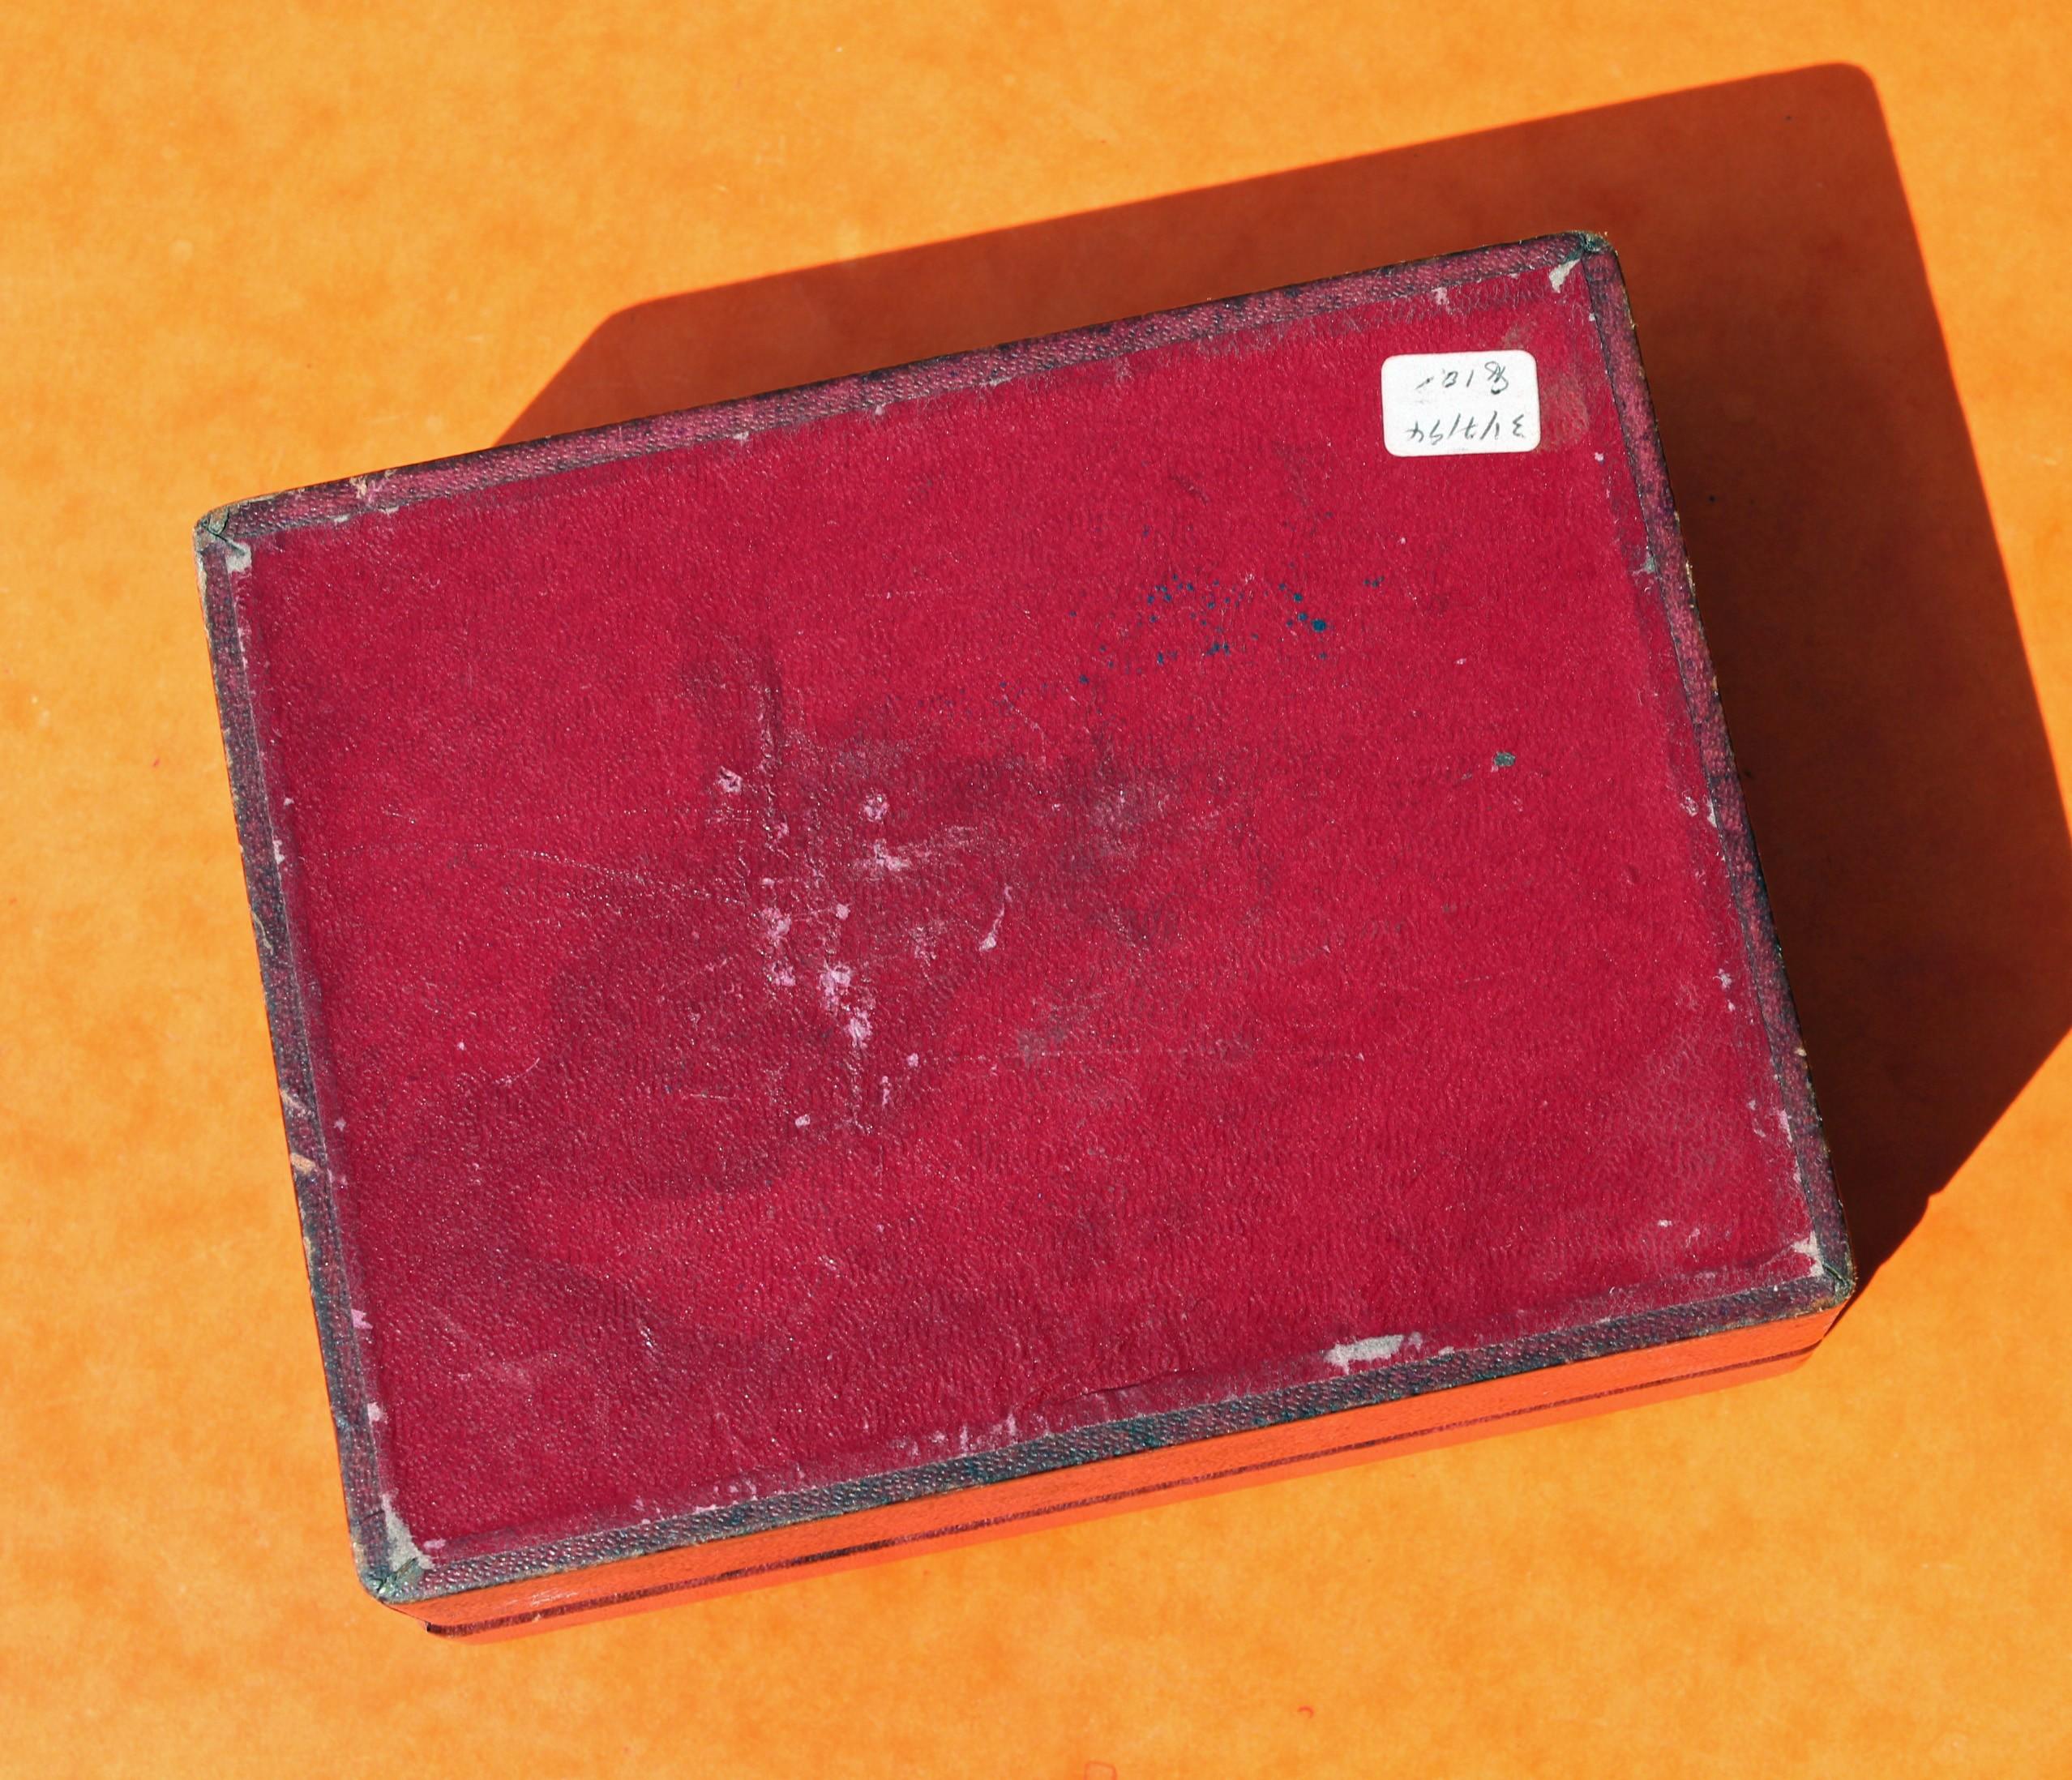 "RARE 40 / 50's VINTAGE ROLEX TUDOR OYSTERDATE PRINCE ""BIG ROSE"" LOGO WOODEN BOX BORDEAUX COLOR"